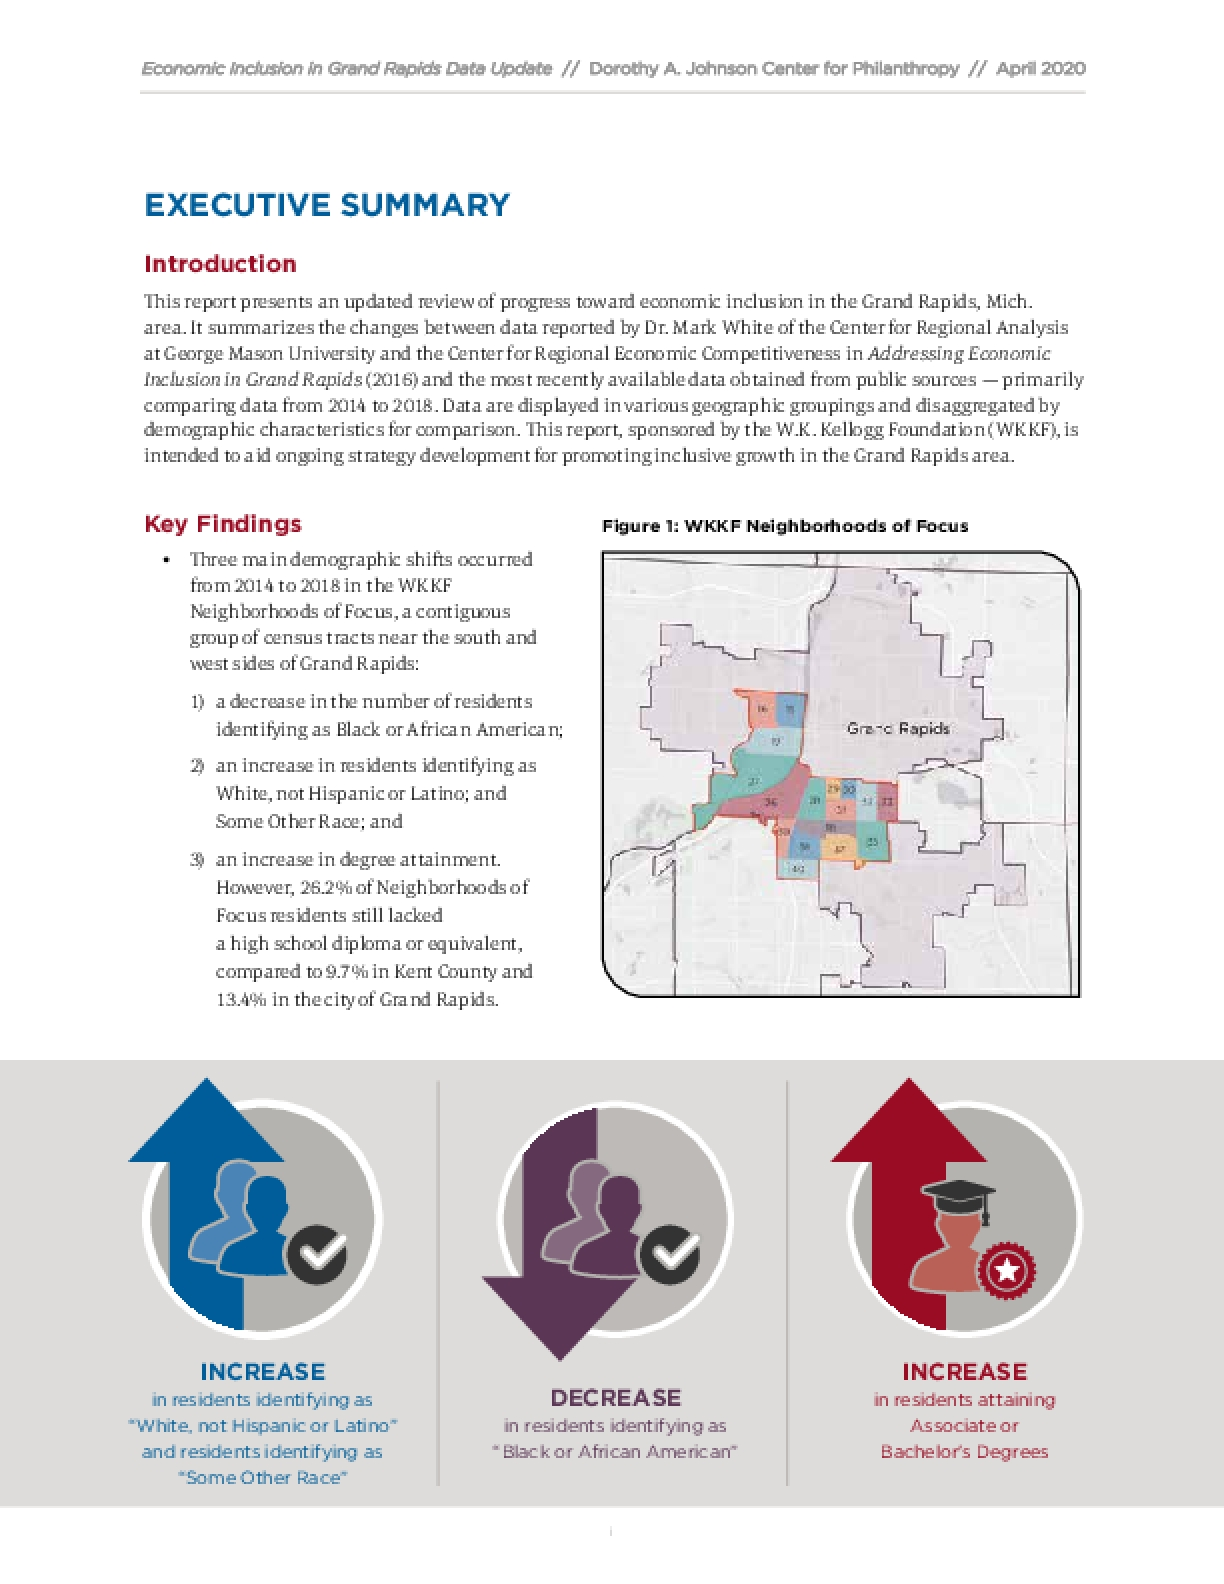 Economic Inclusion in Grand Rapids Data Update - Executive Summary